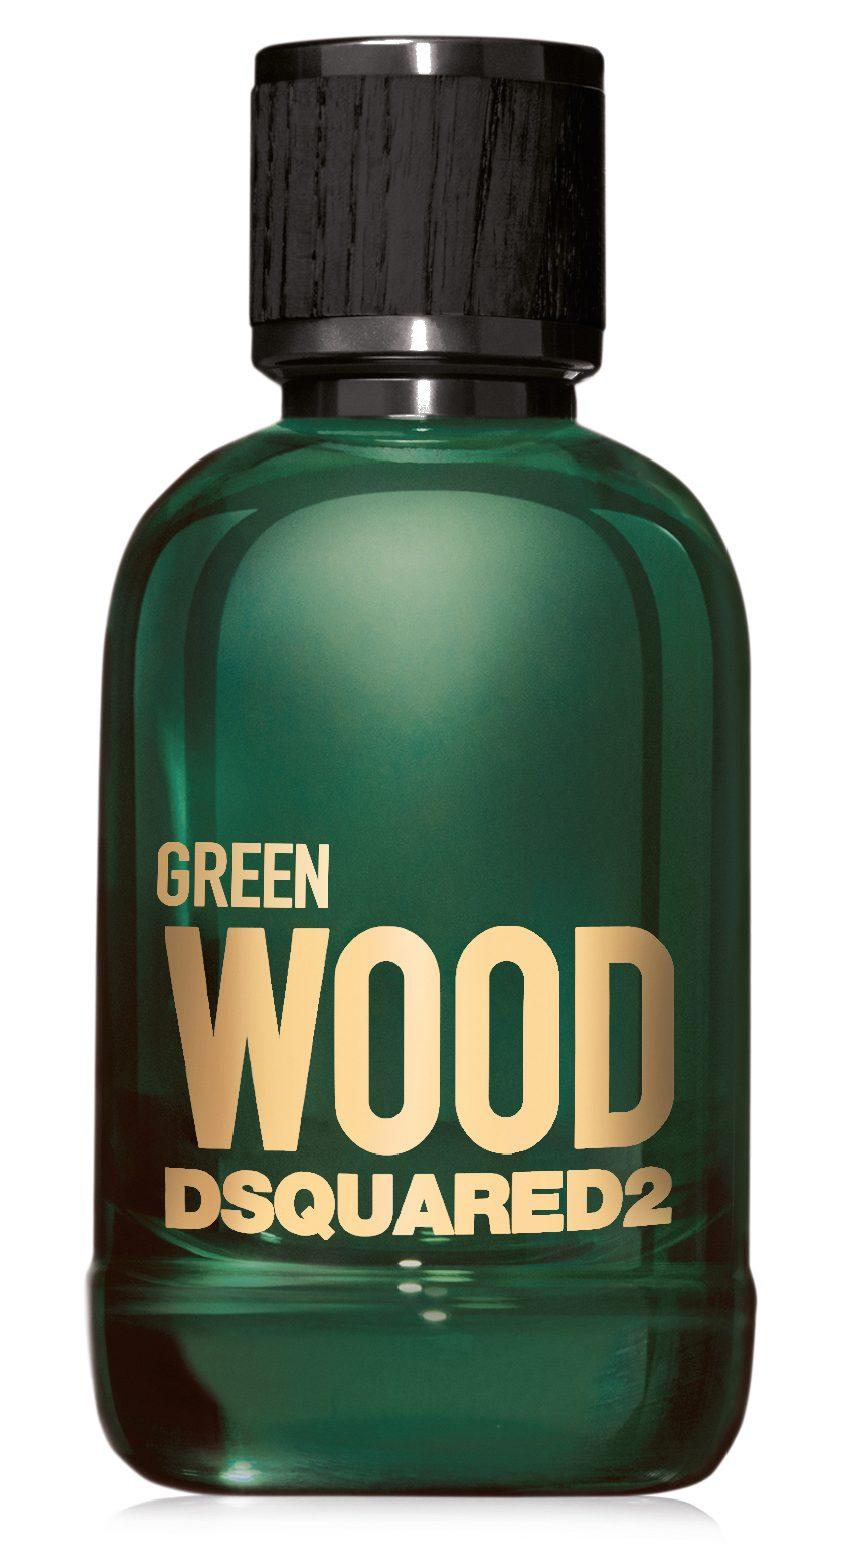 DSQUARED2_GREEN_WOOD